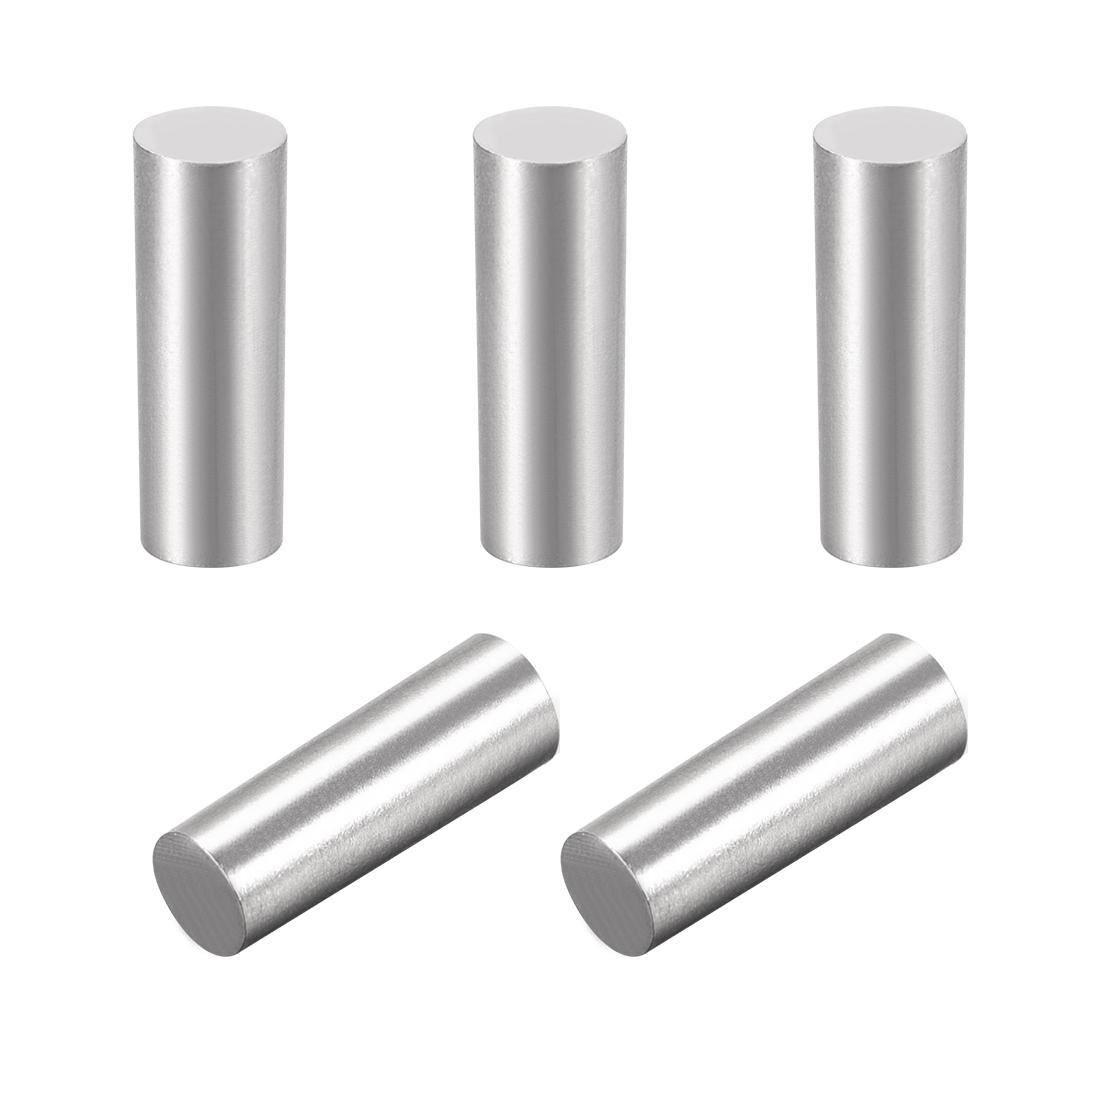 5Pcs 4mm x 12mm 1:50 Taper Pin 304 Stainless Steel Shelf Support Pin Fasten